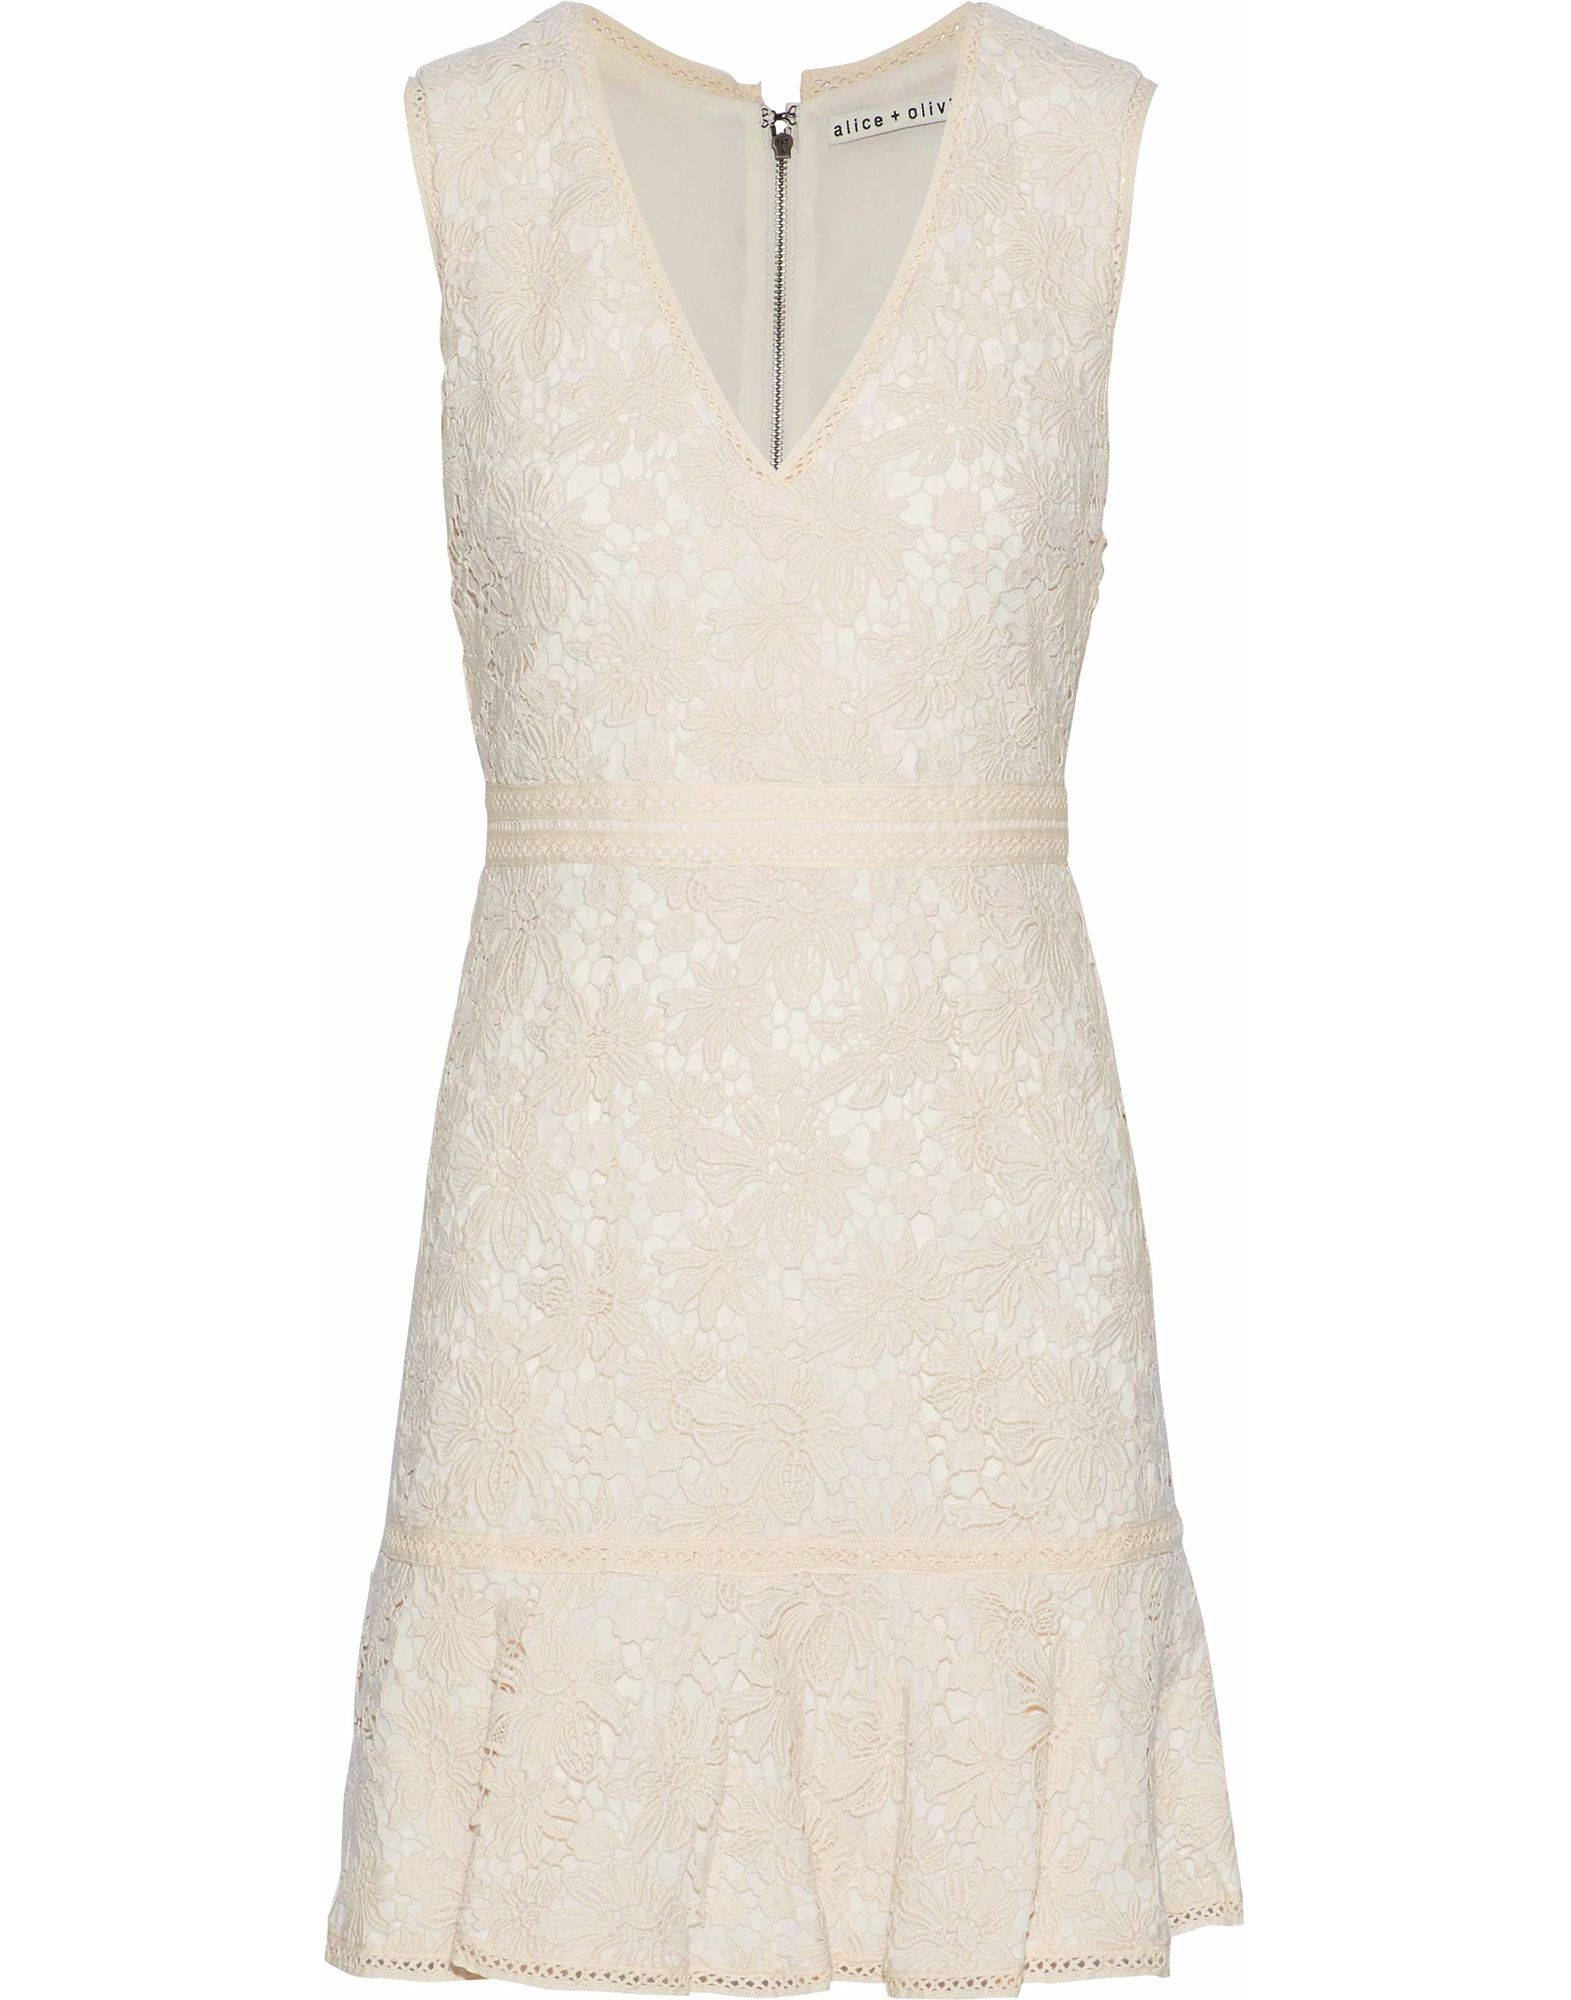 ALICE + OLIVIA Short dresses. lace, no appliqués, solid color, v-neck, sleeveless, no pockets, rear closure, zip, fully lined. 100% Cotton